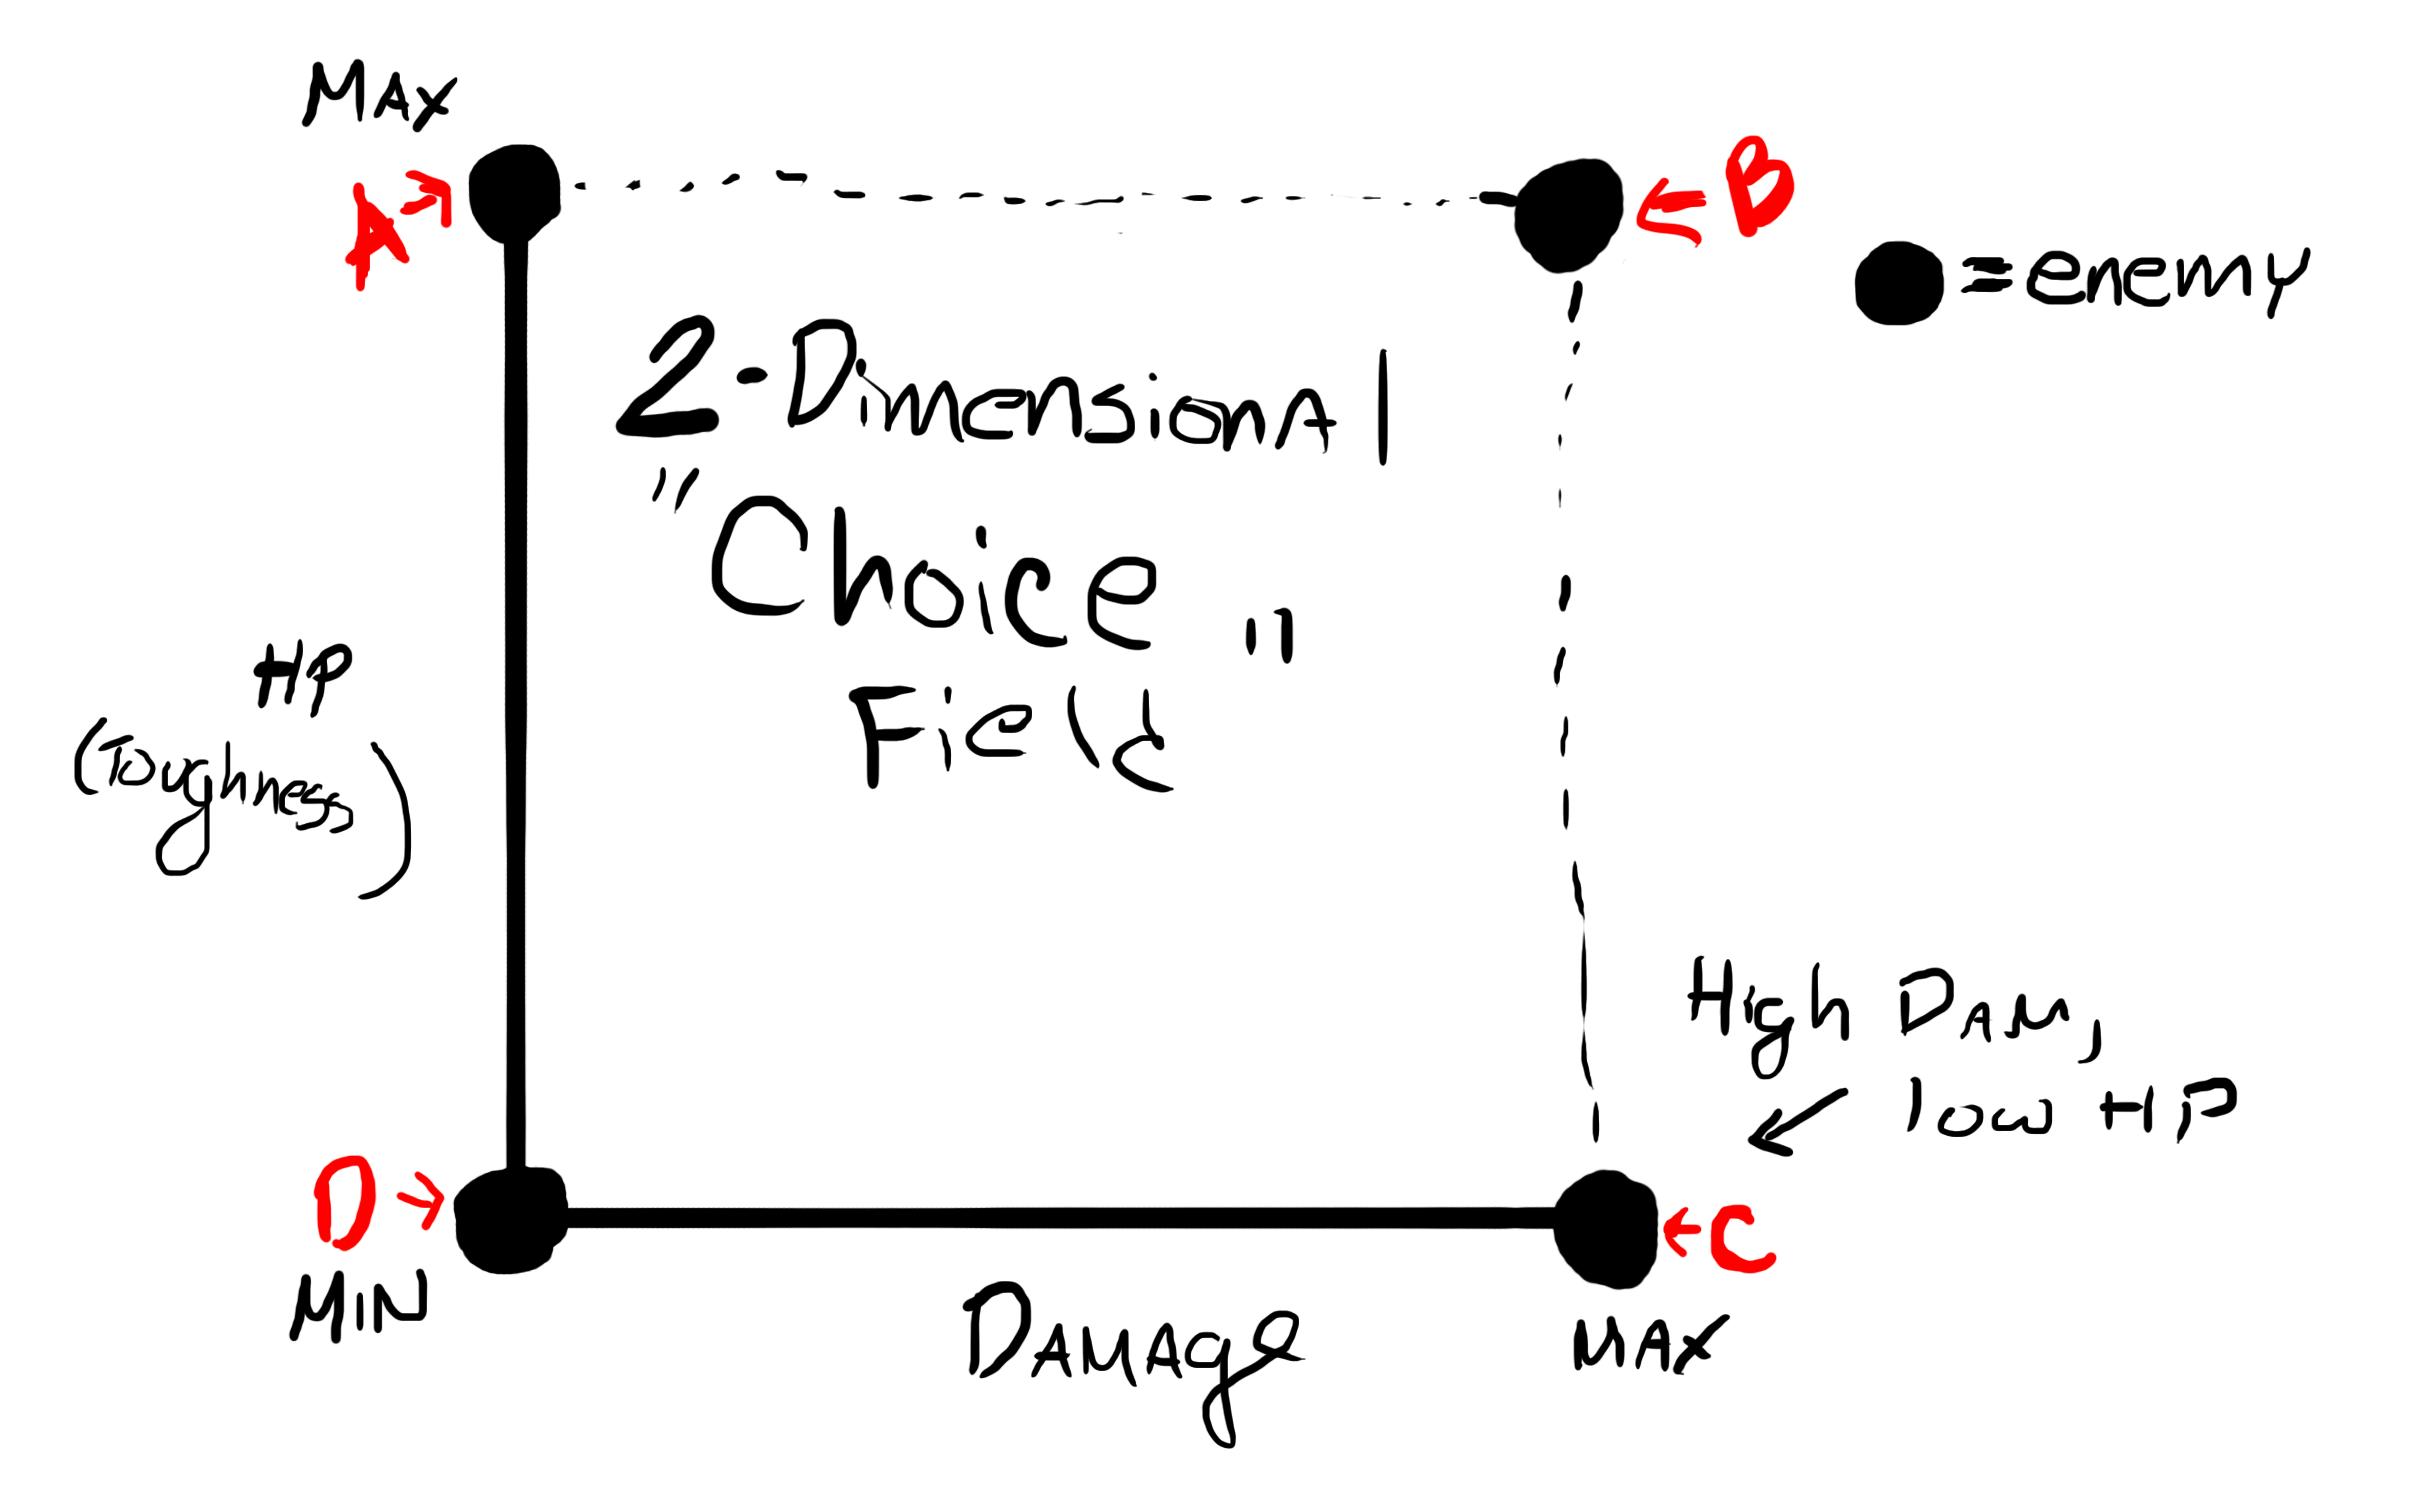 Trinity Part 2 Choice Fields Chaotic Stupid